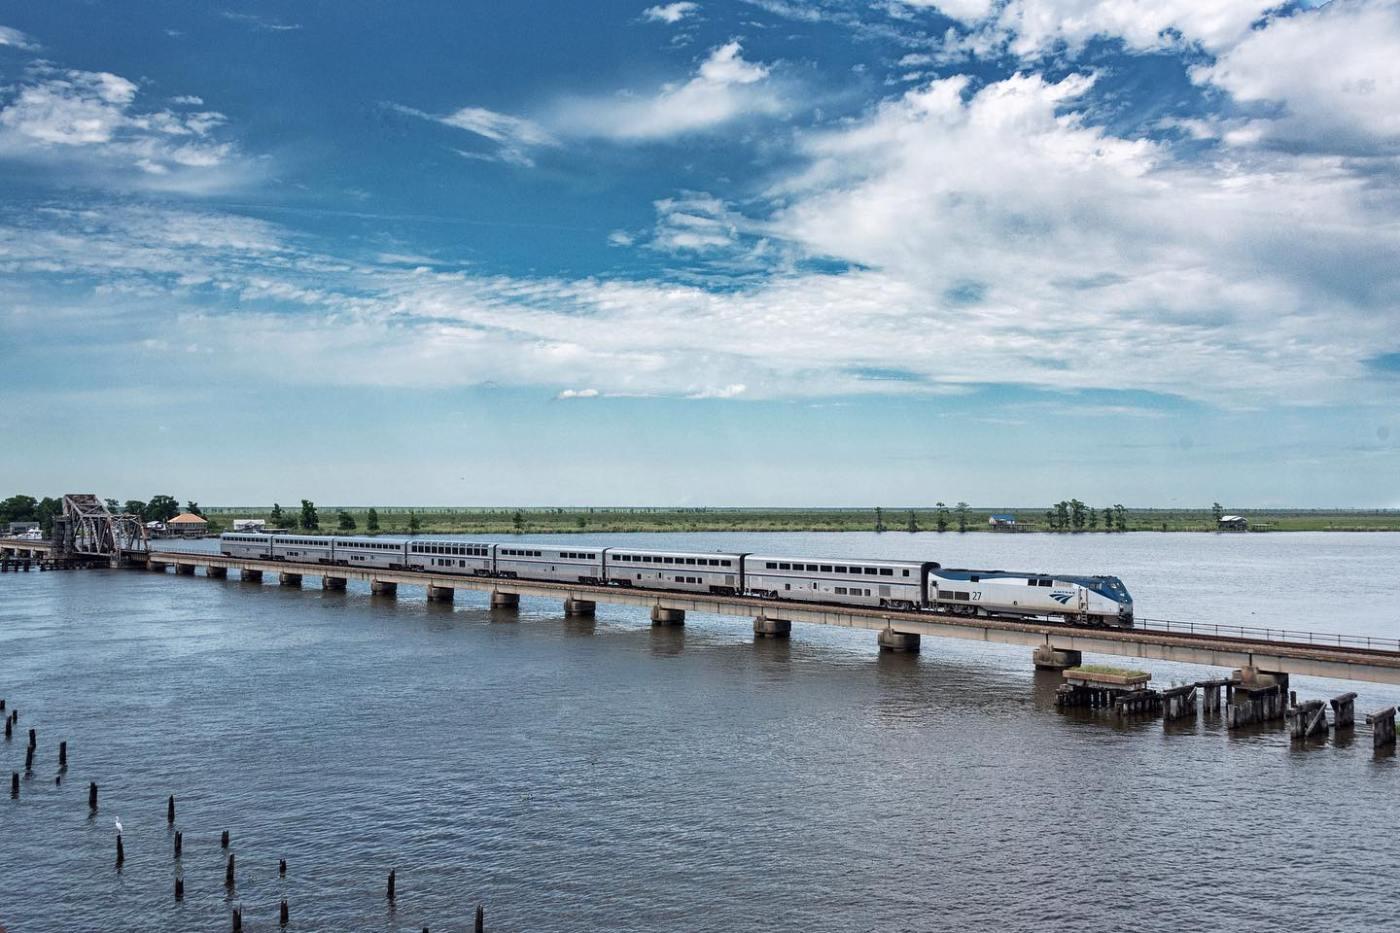 Amtrak's New Orleans route. Photo via Amtrak's Facebook